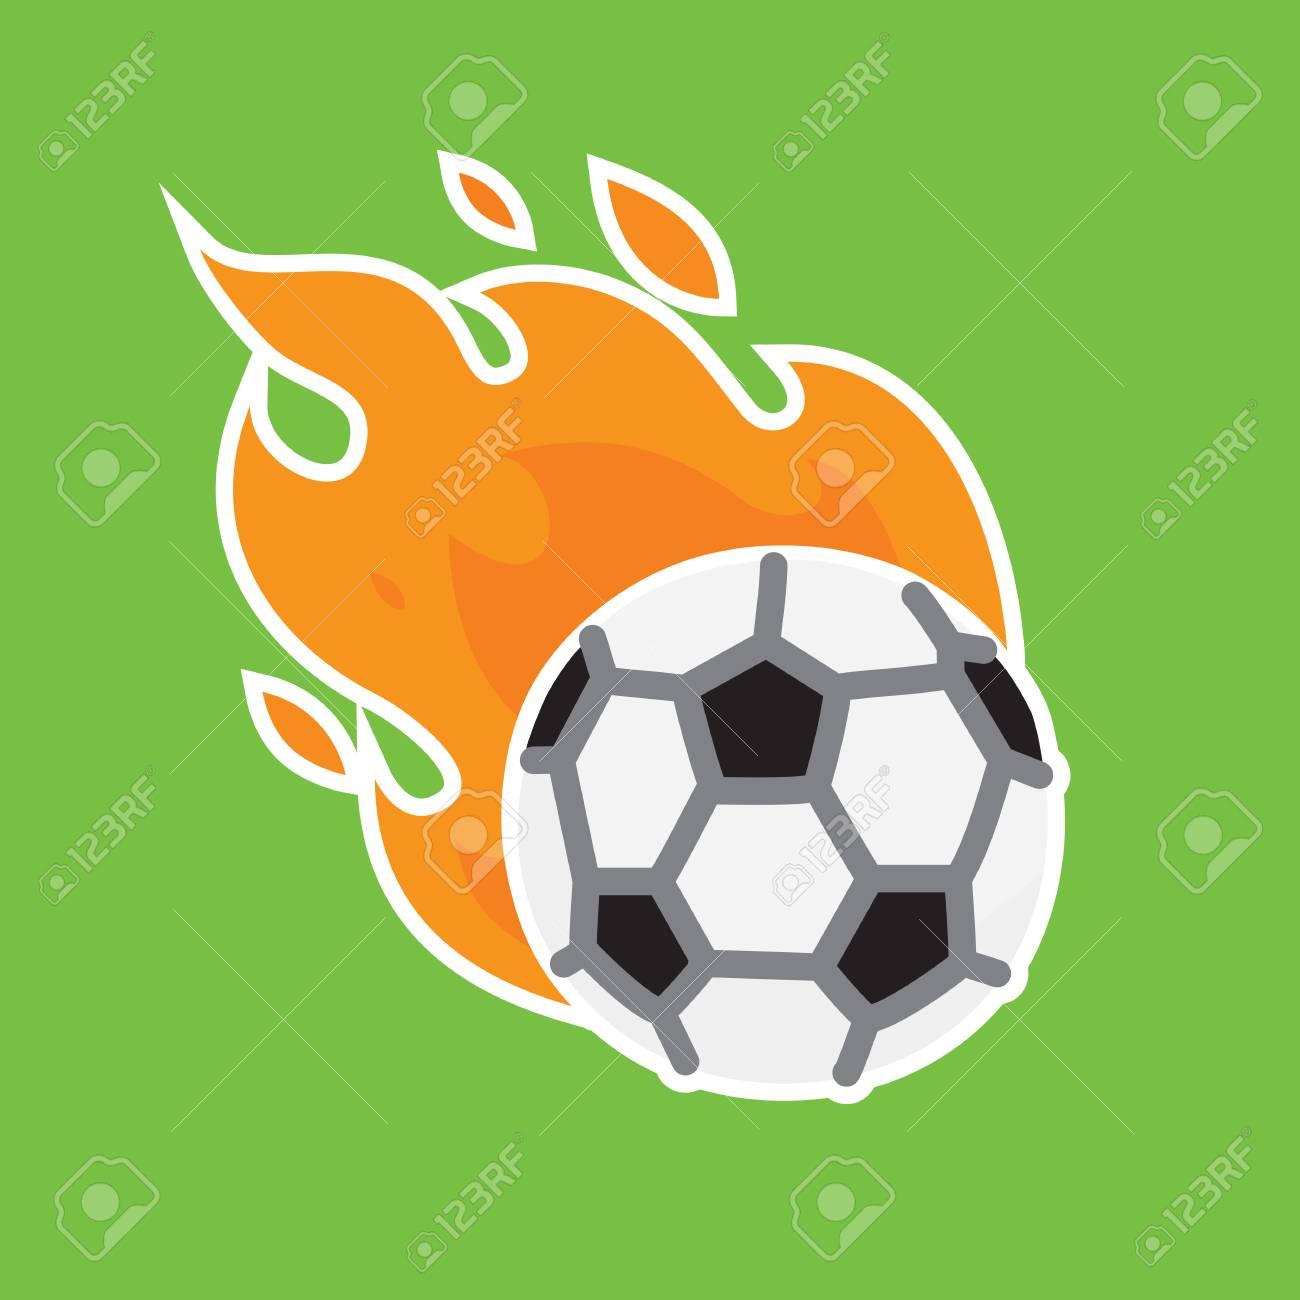 football team icon template isolated vector illustration royalty rh 123rf com free vector football helmet free vector football shirt